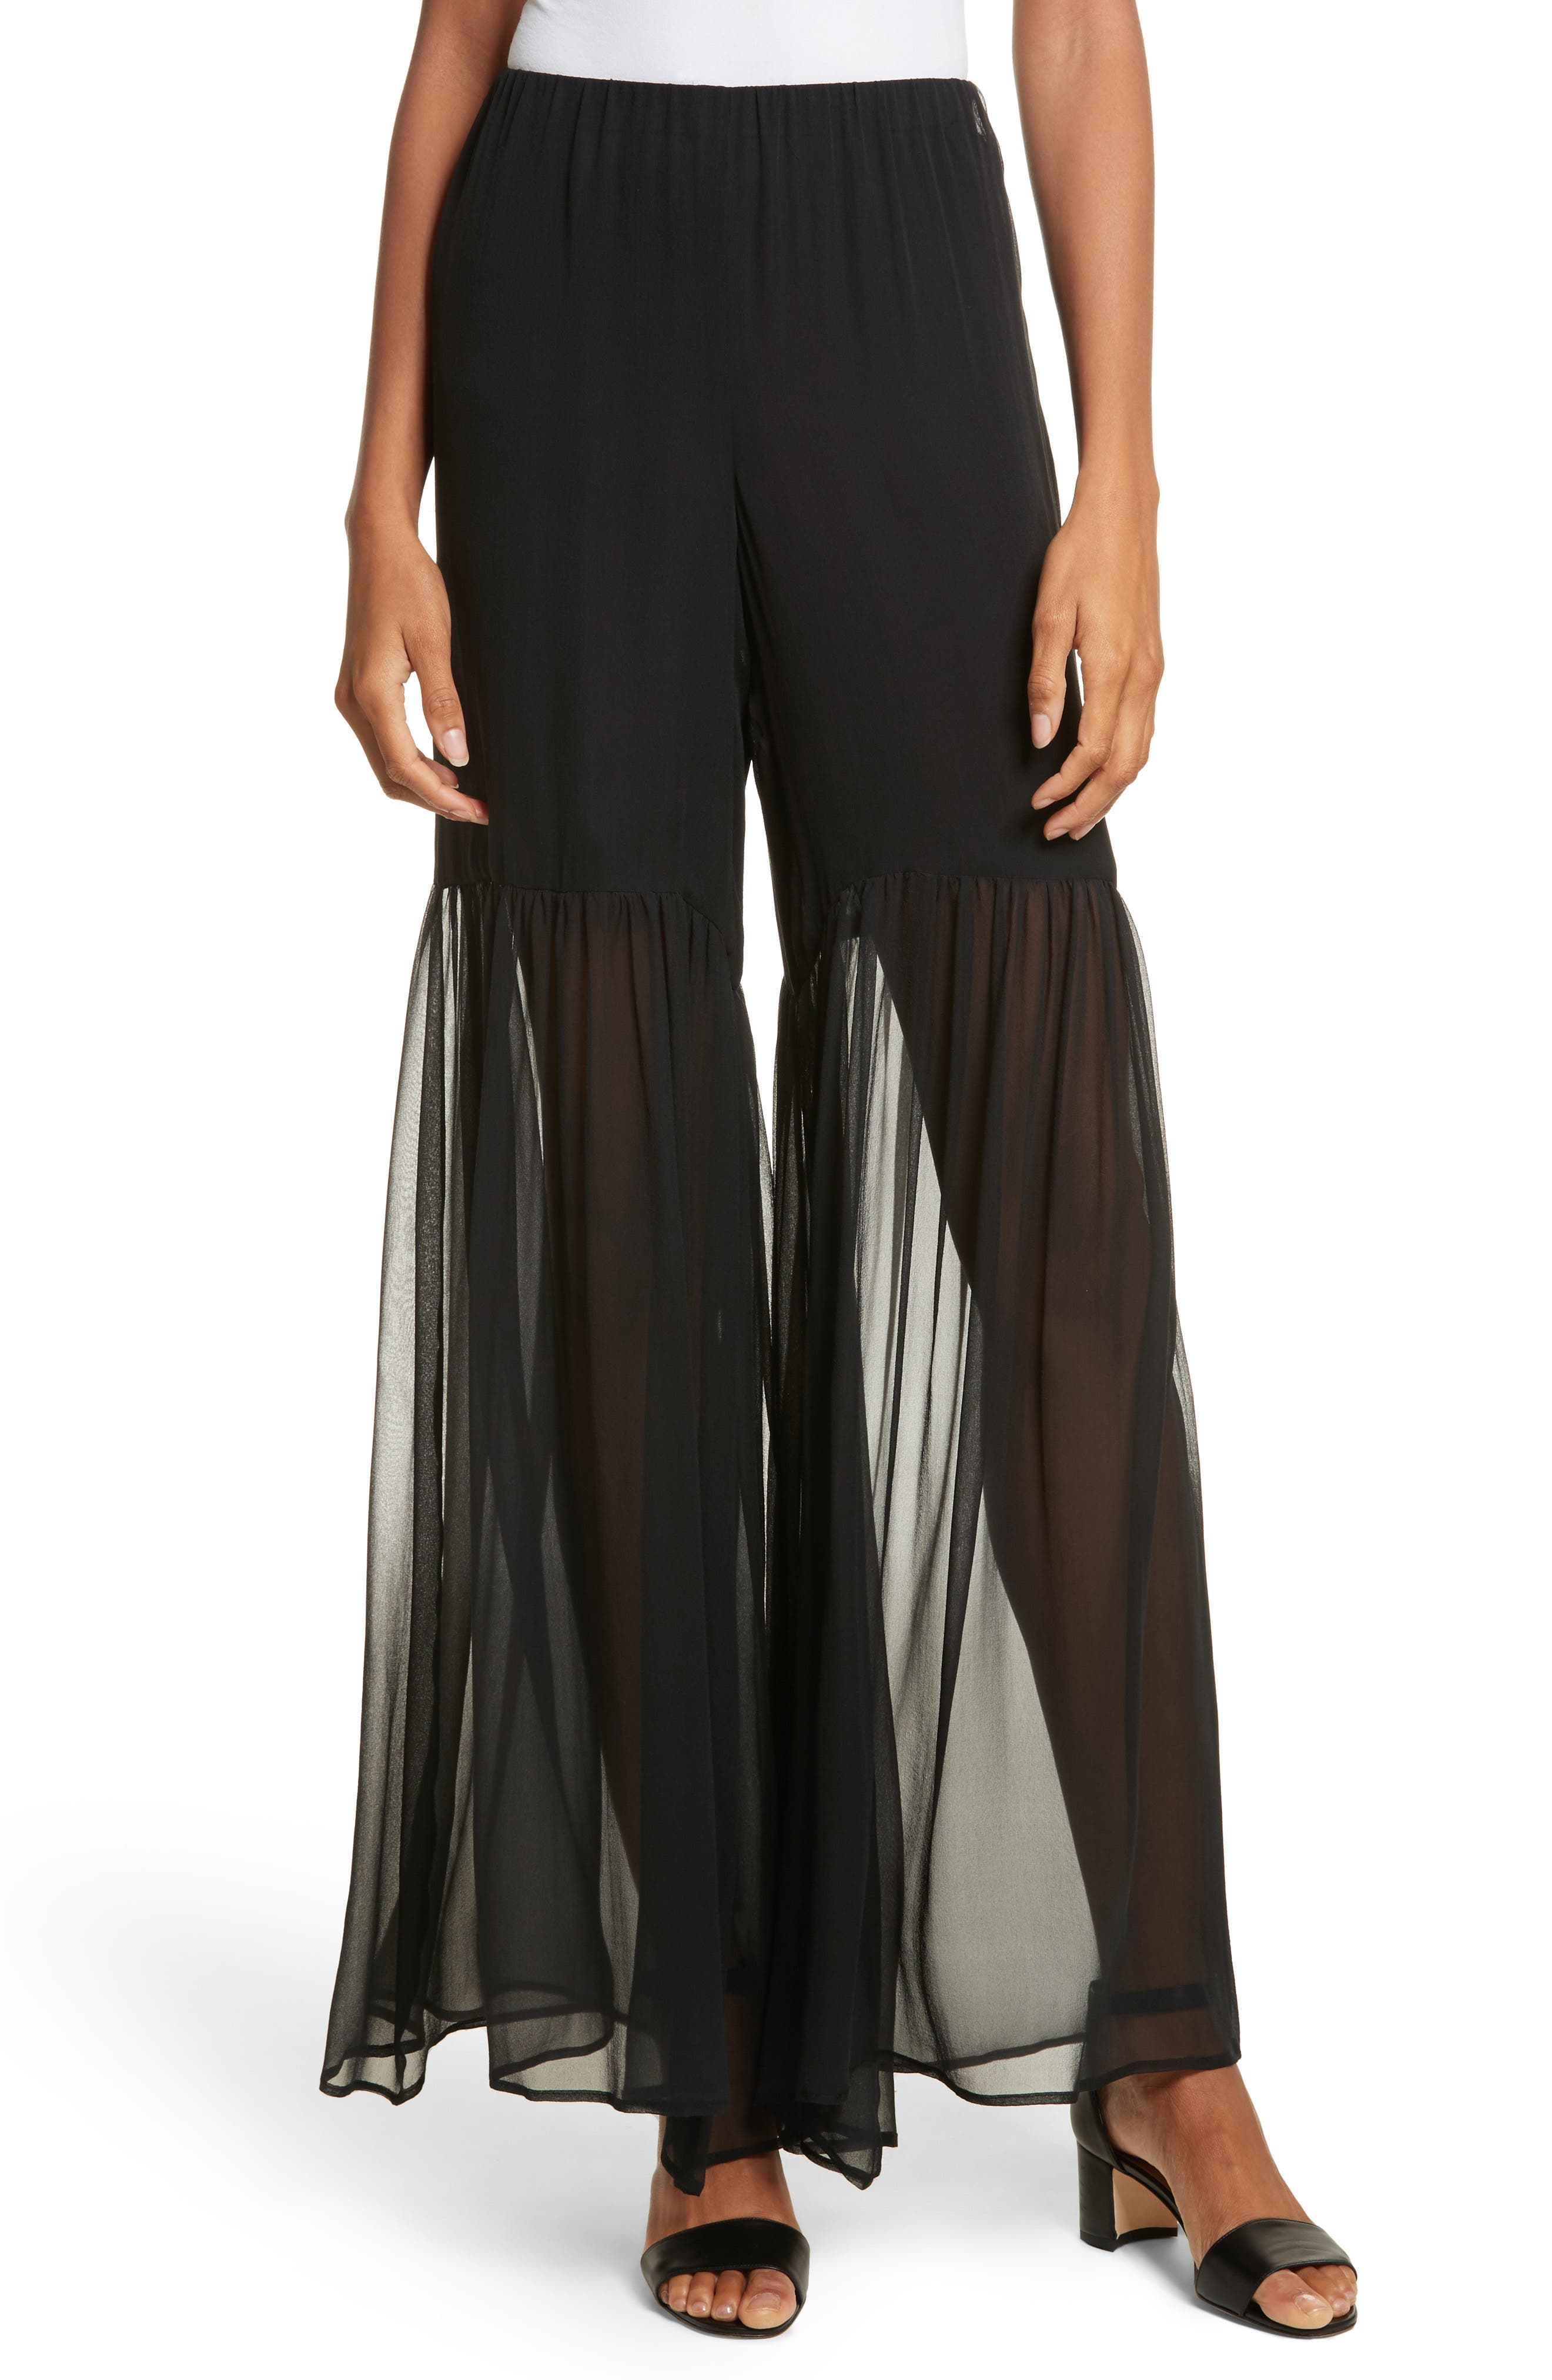 Caroline Constas Summer Sheered Pants